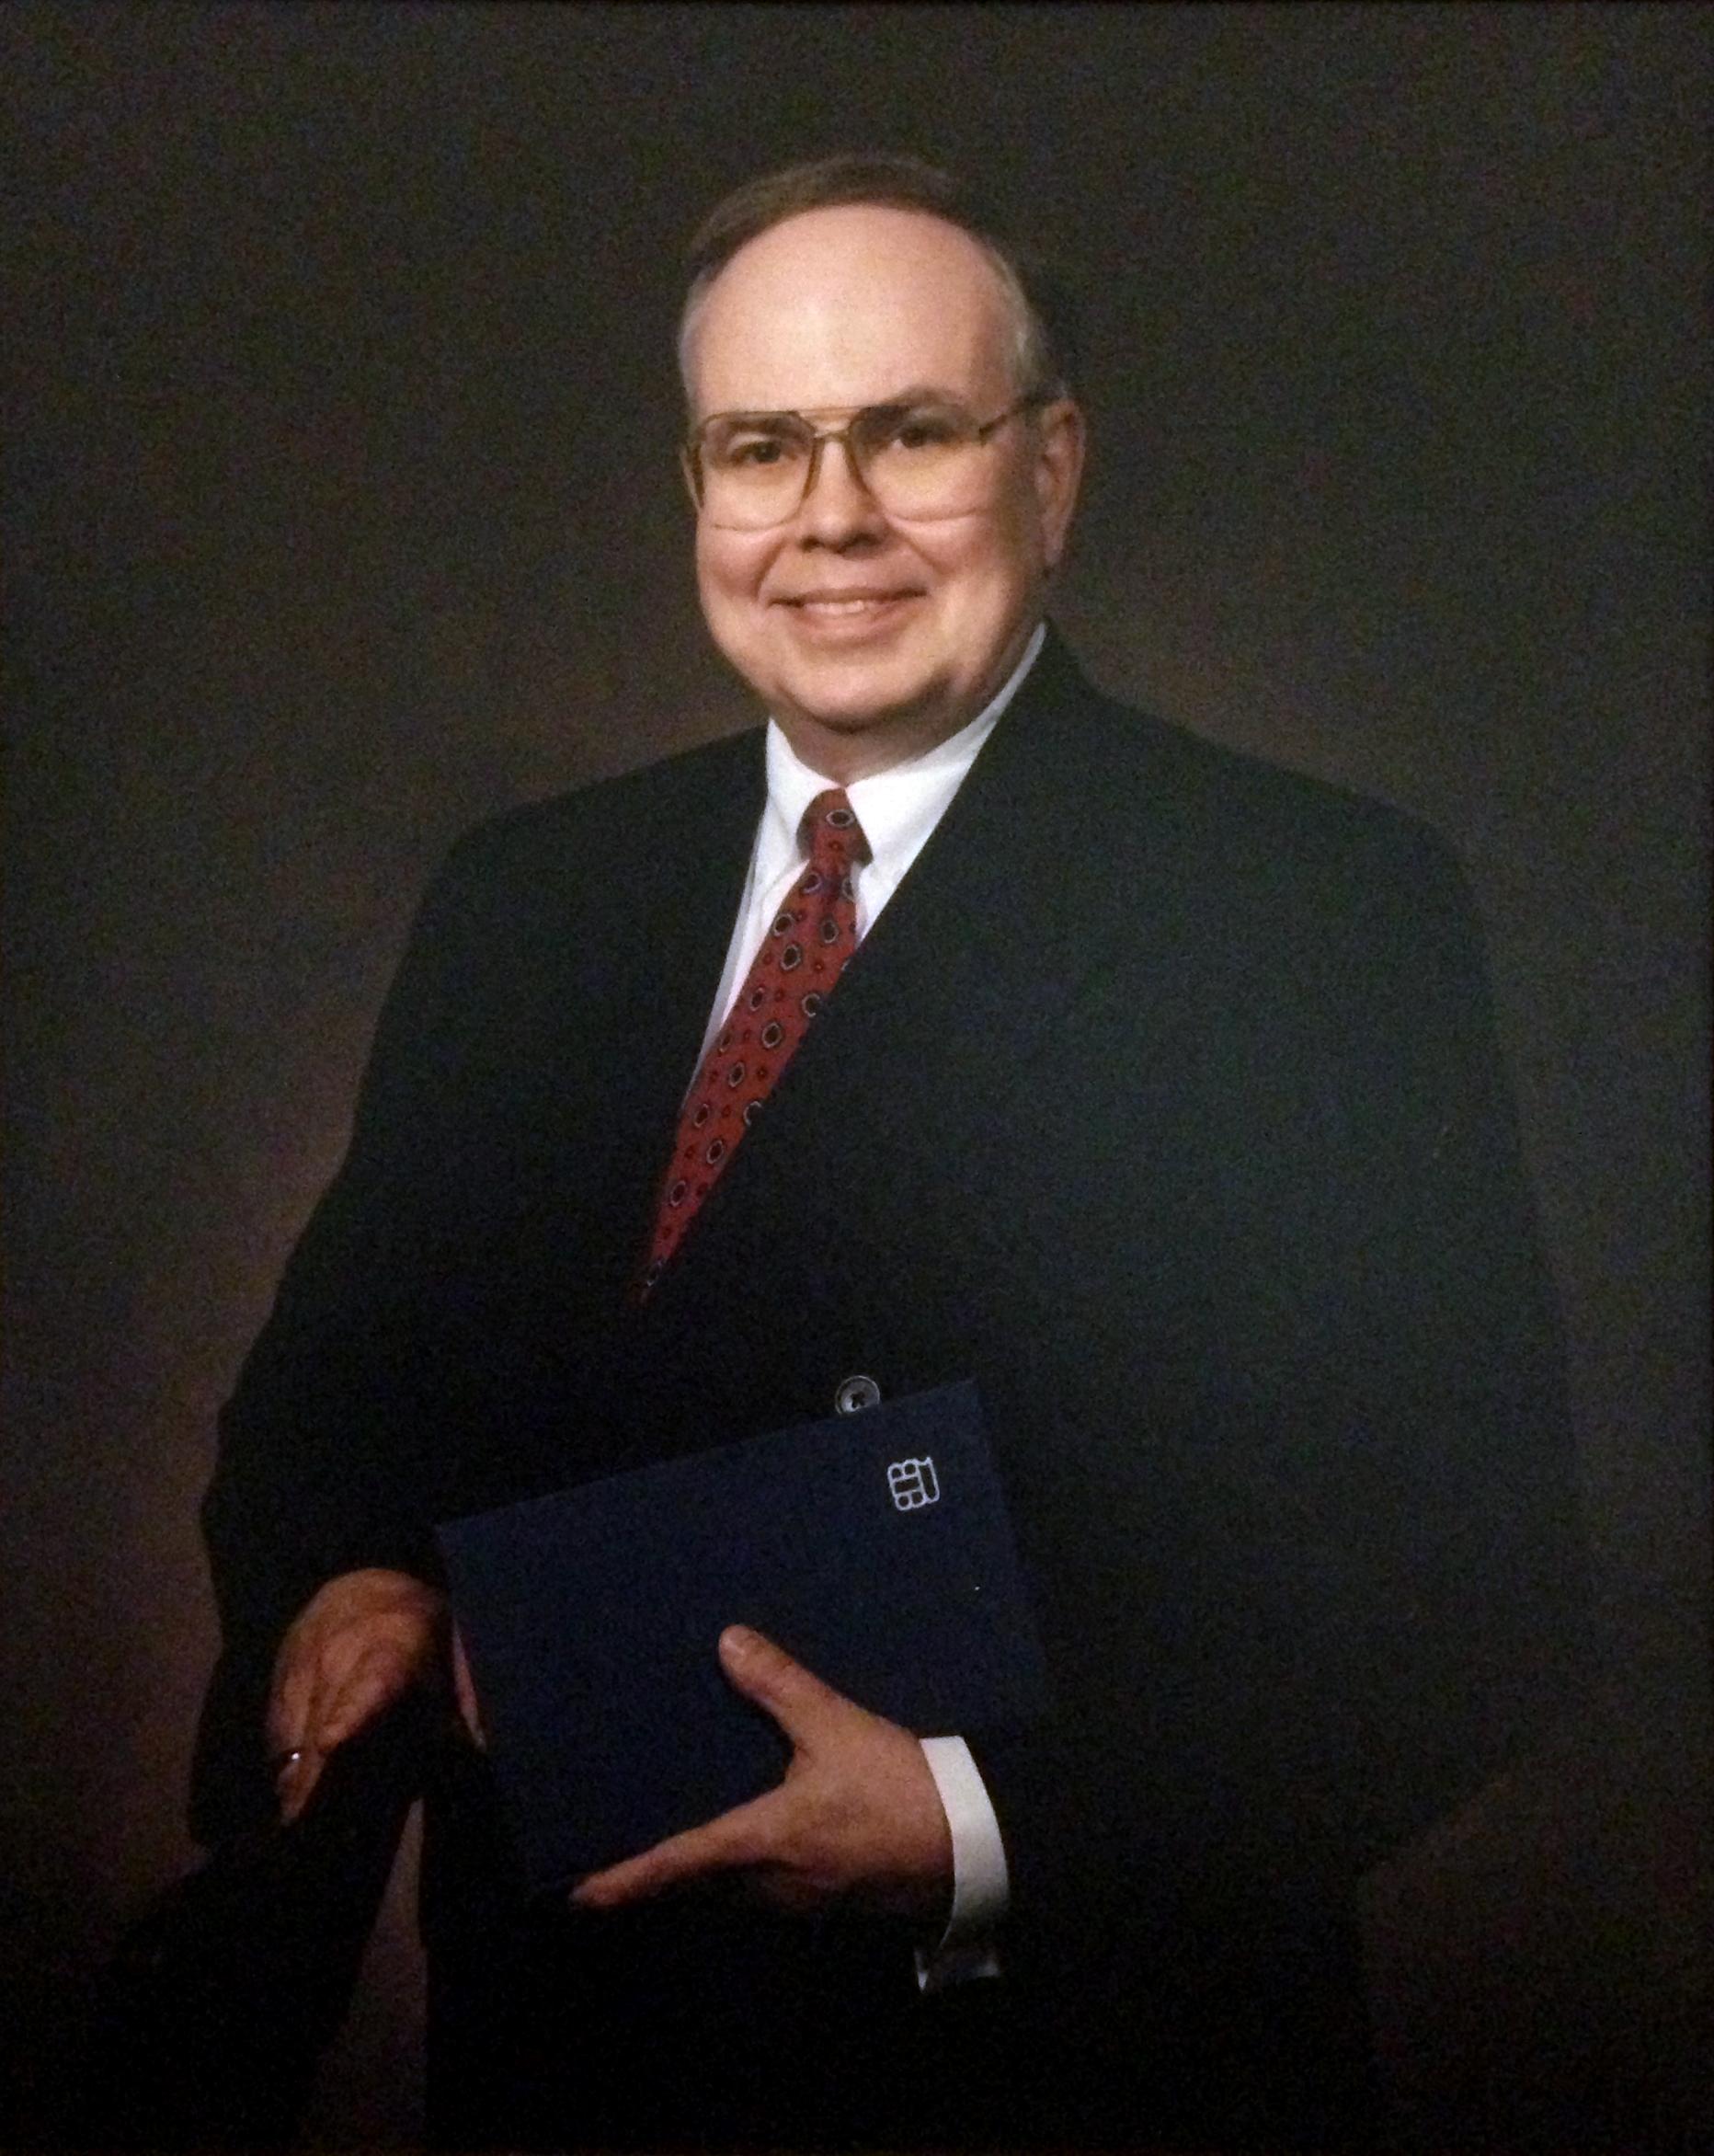 Thomas G. Gutteridge. Dean 1992-2003.